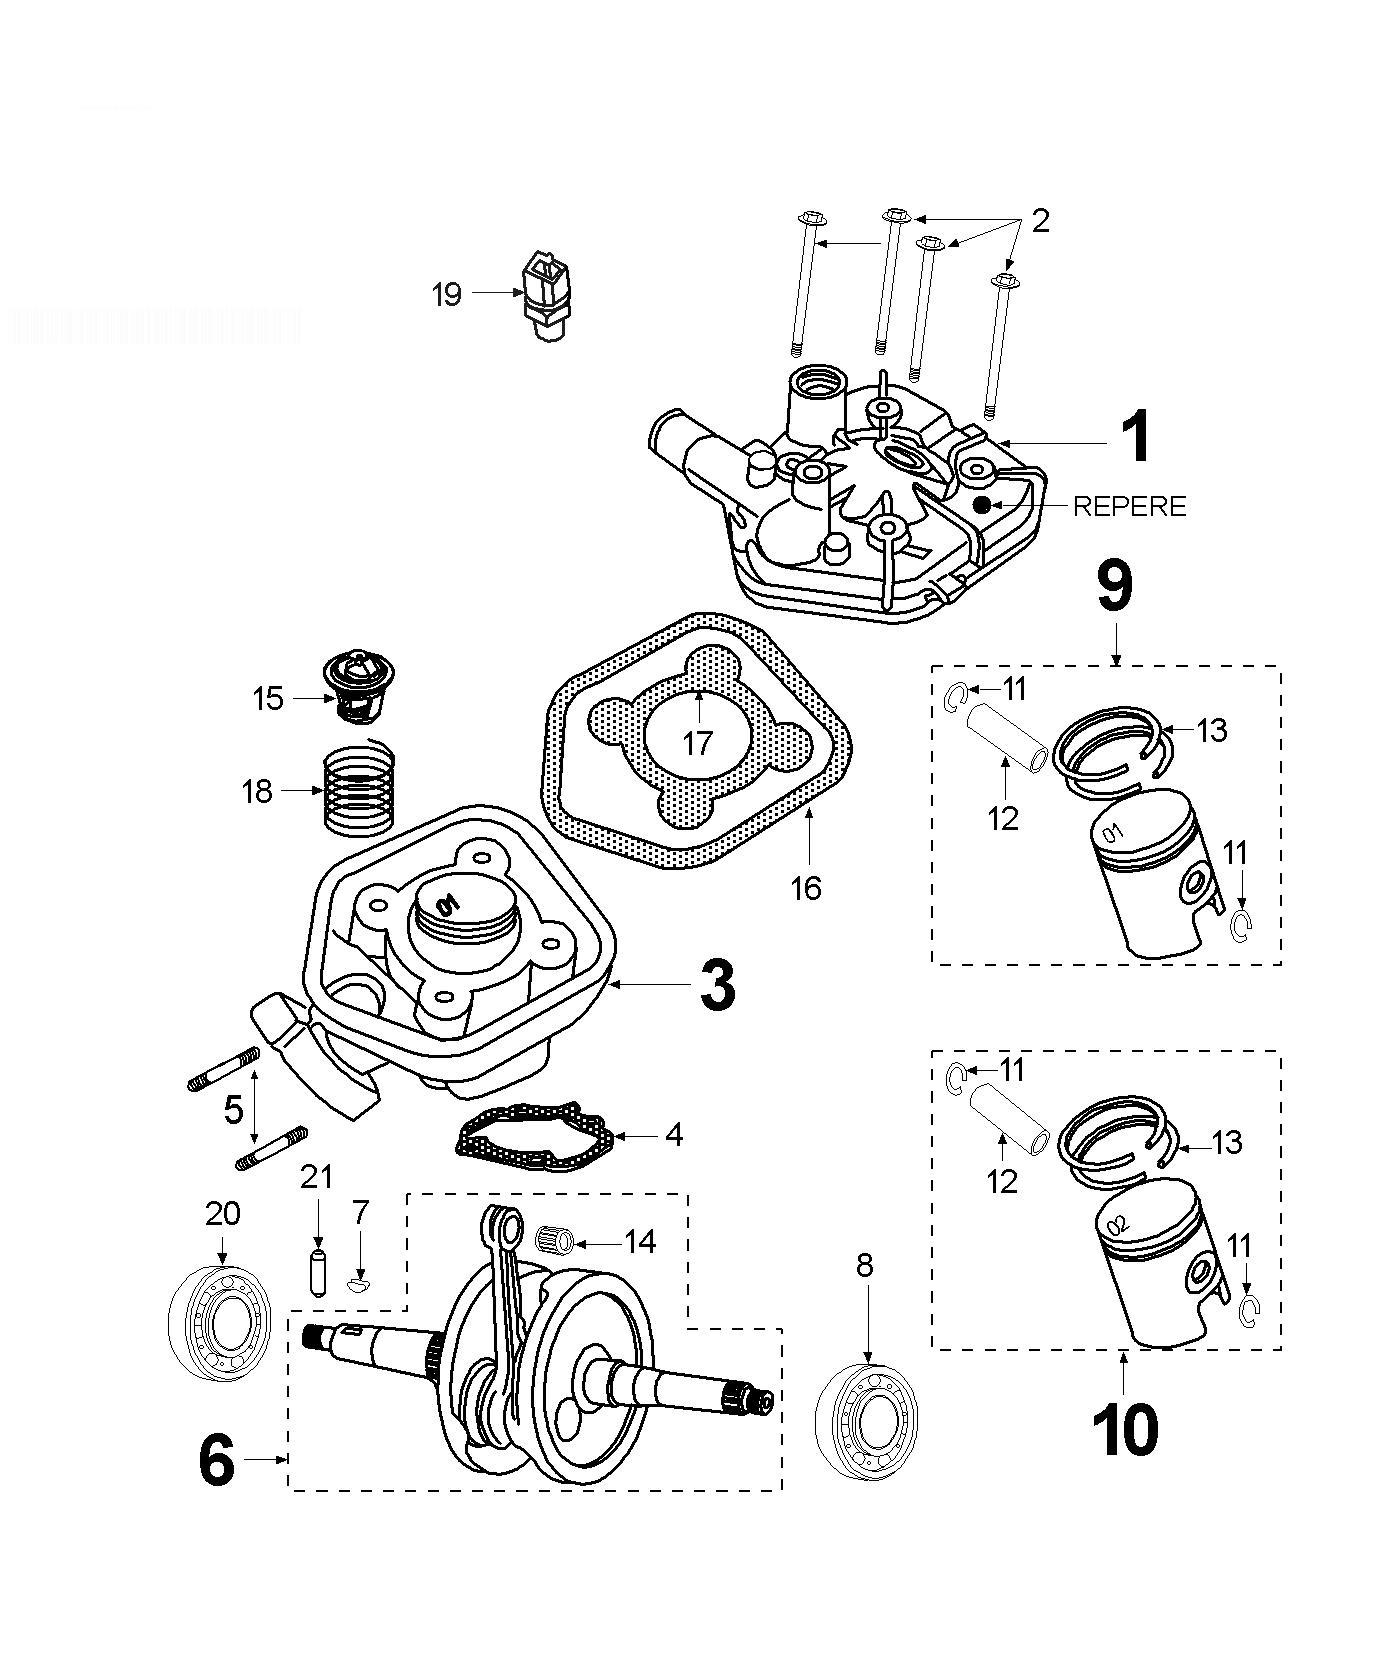 PEUGEOT SPEEDFIGHT 2 50 WRC L2P Crankshaft Cylinder